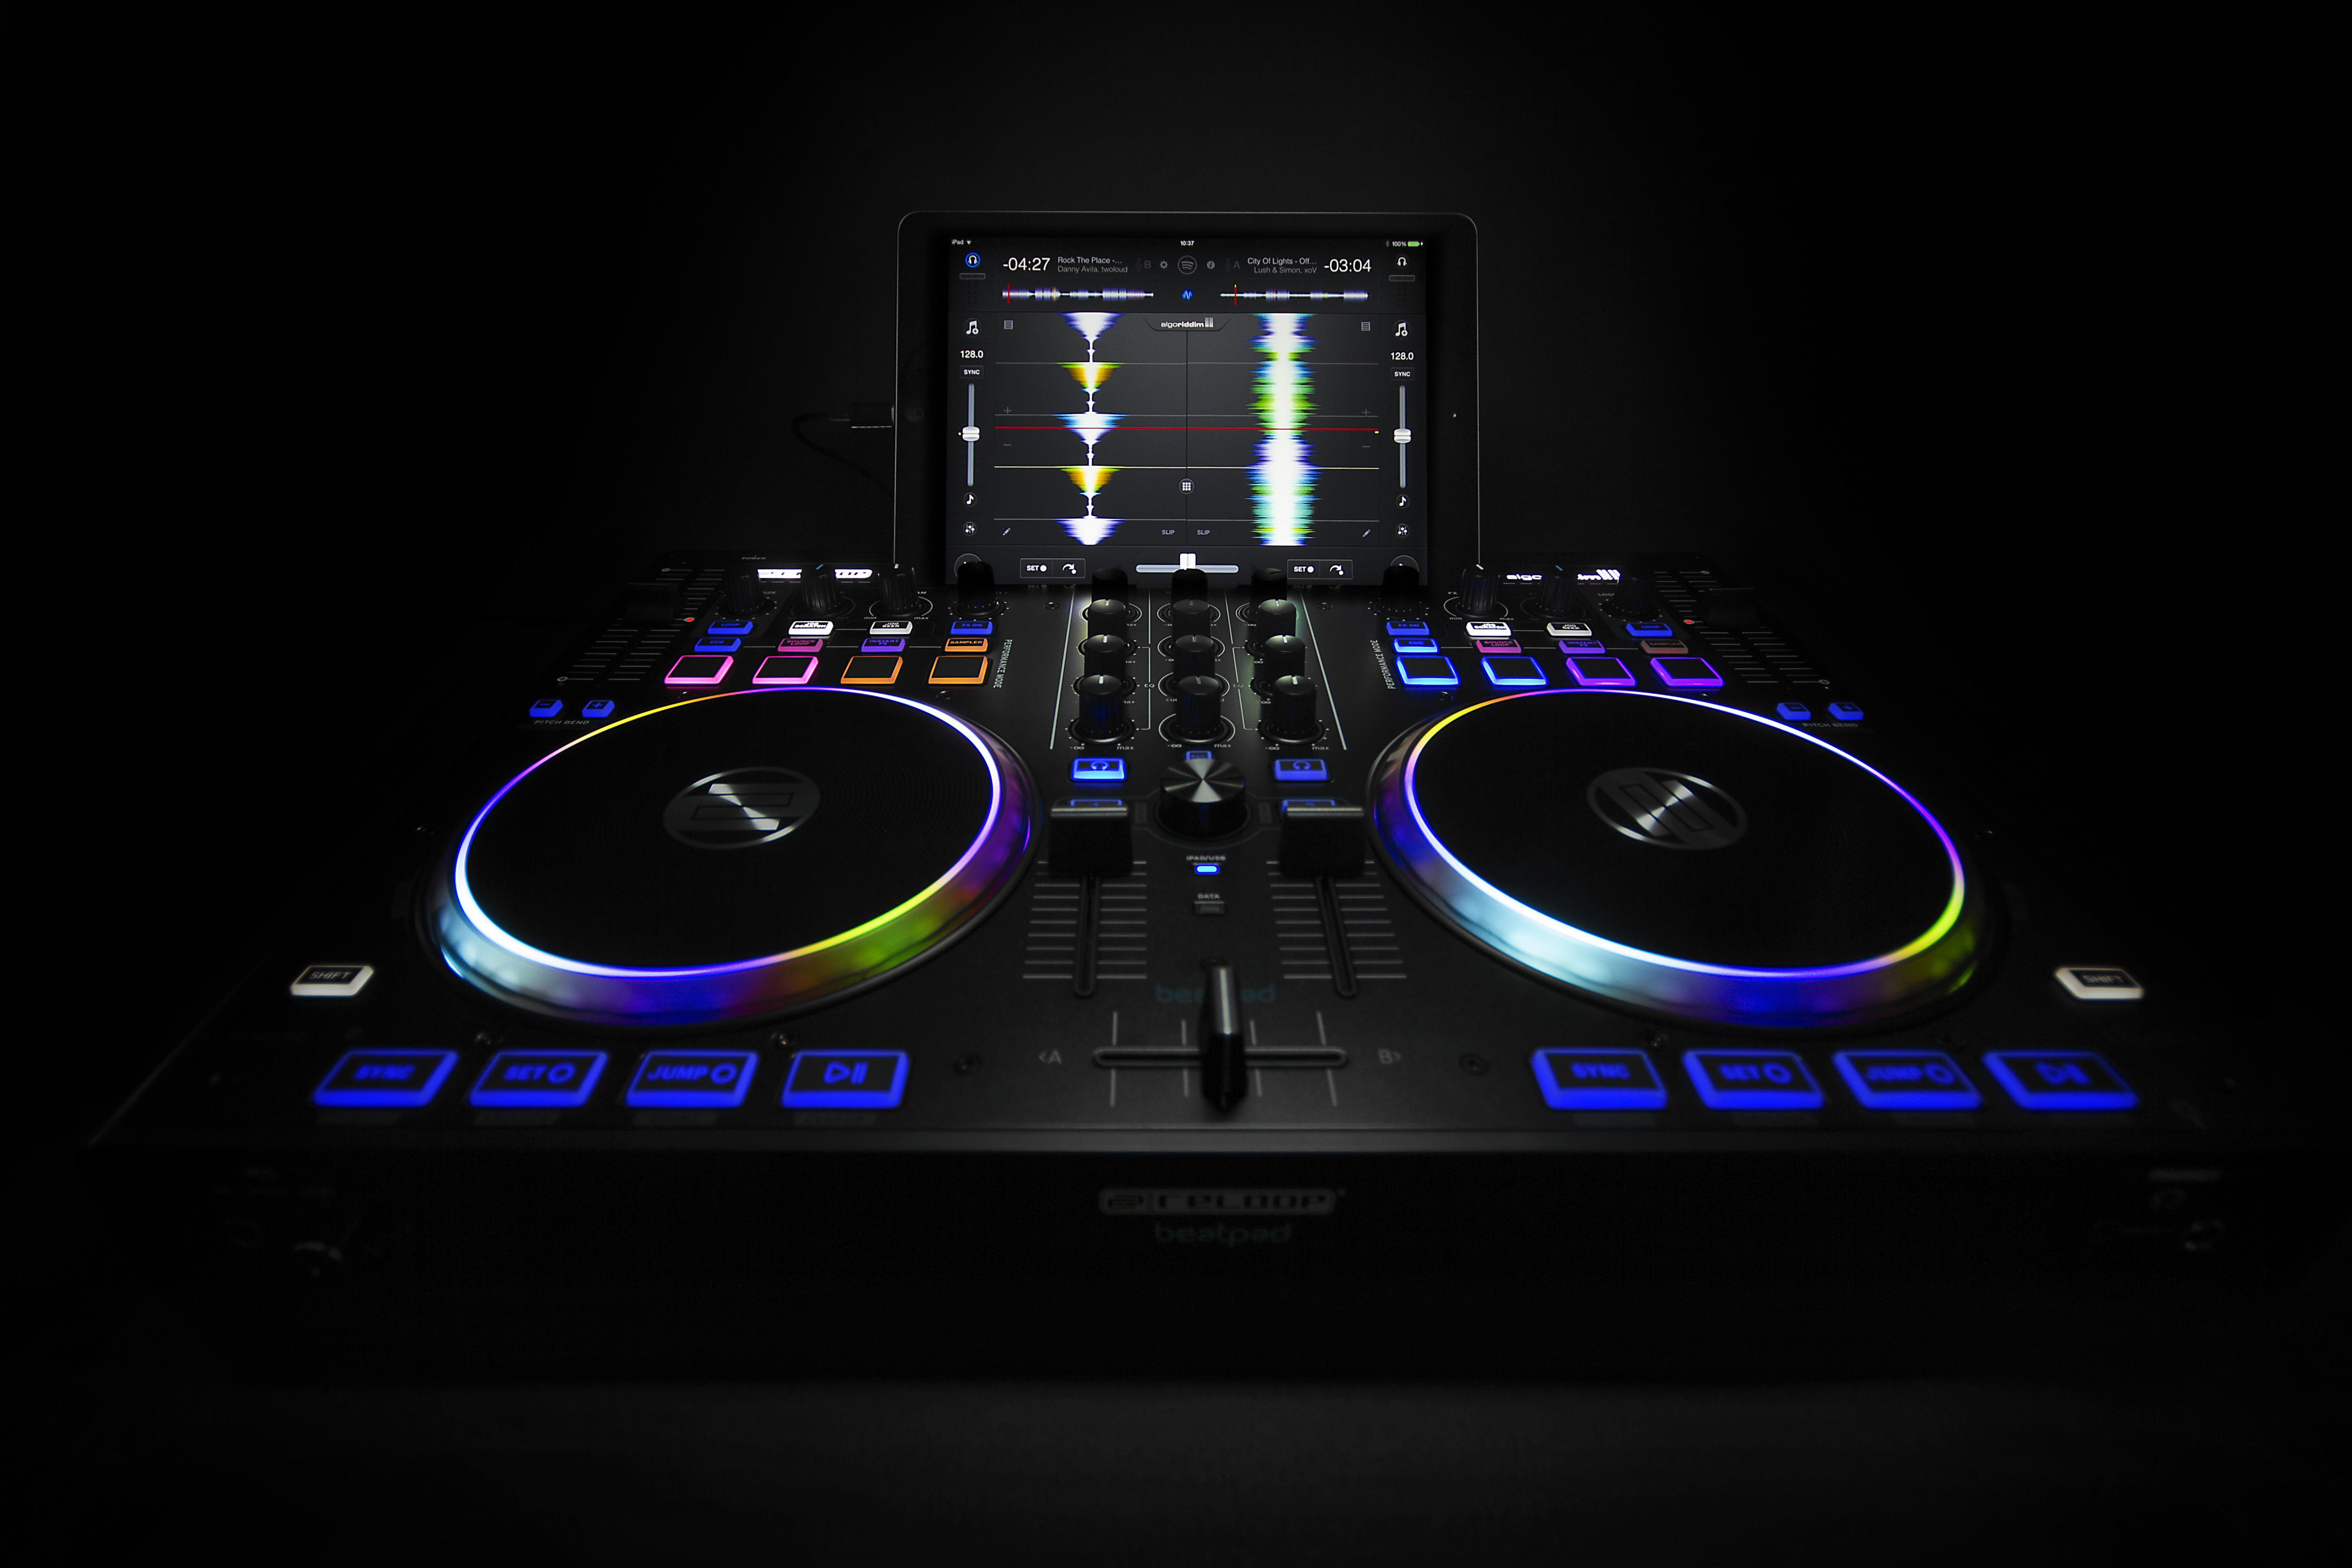 Algoriddim Adds Spotify to Djay 2 5 iOS App - DJ TechTools